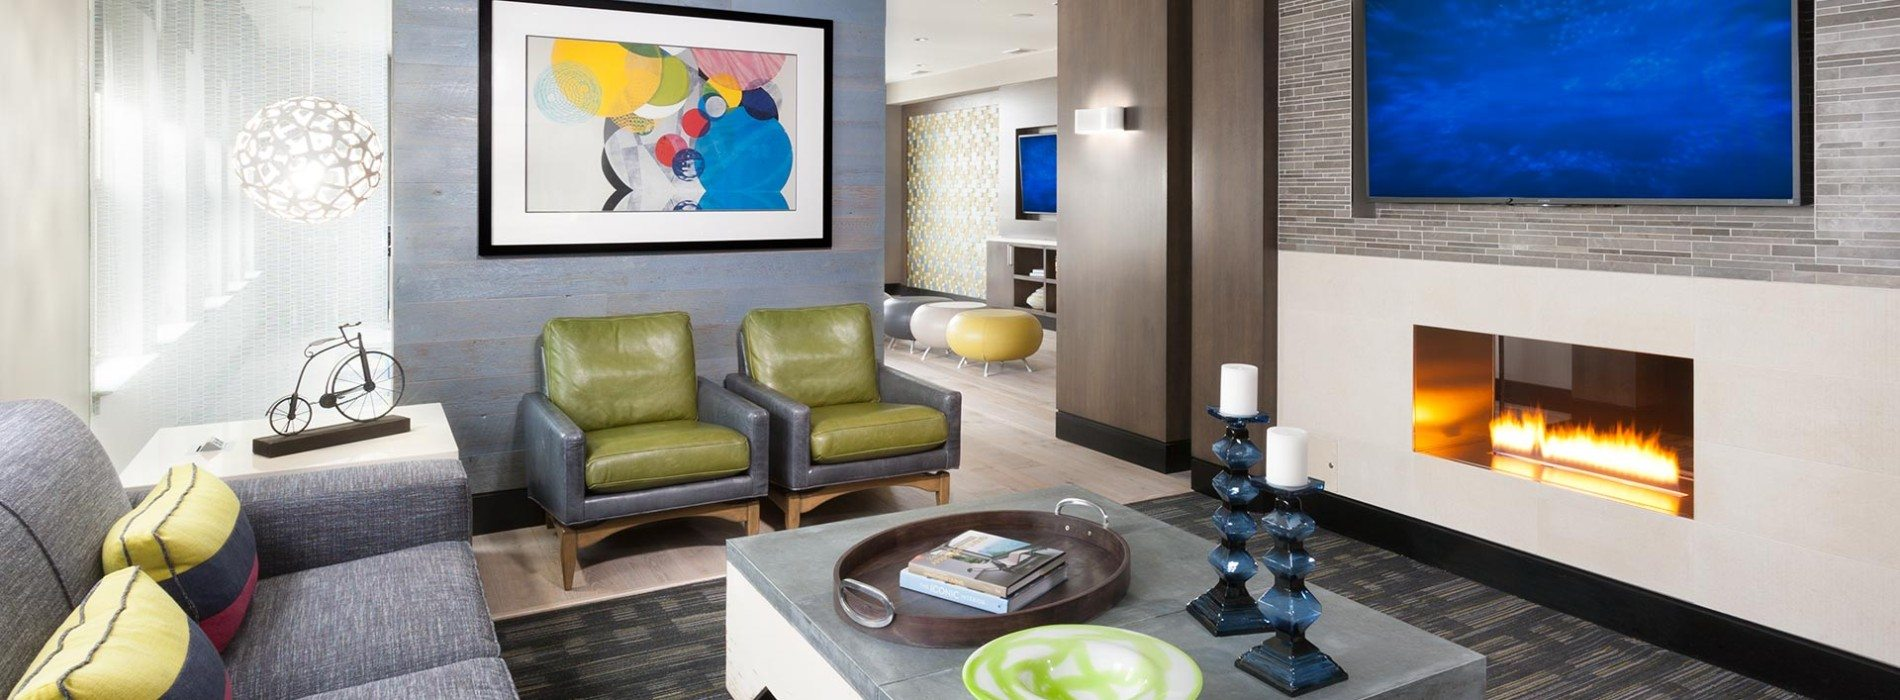 Best-Apartment-communities-DC-Swift-Petworth